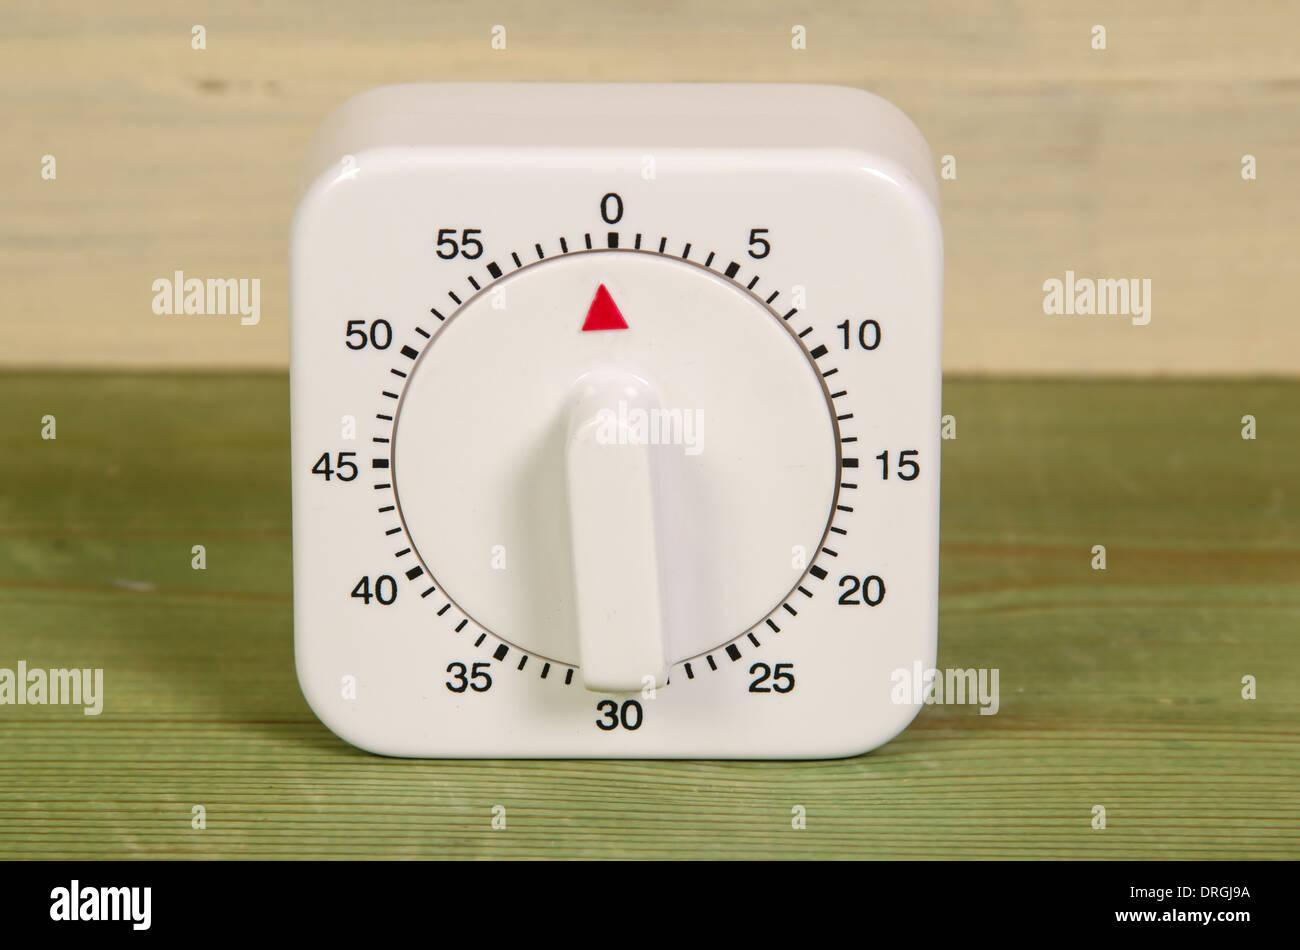 Timekeeper Stock Photos & Timekeeper Stock Images - Alamy